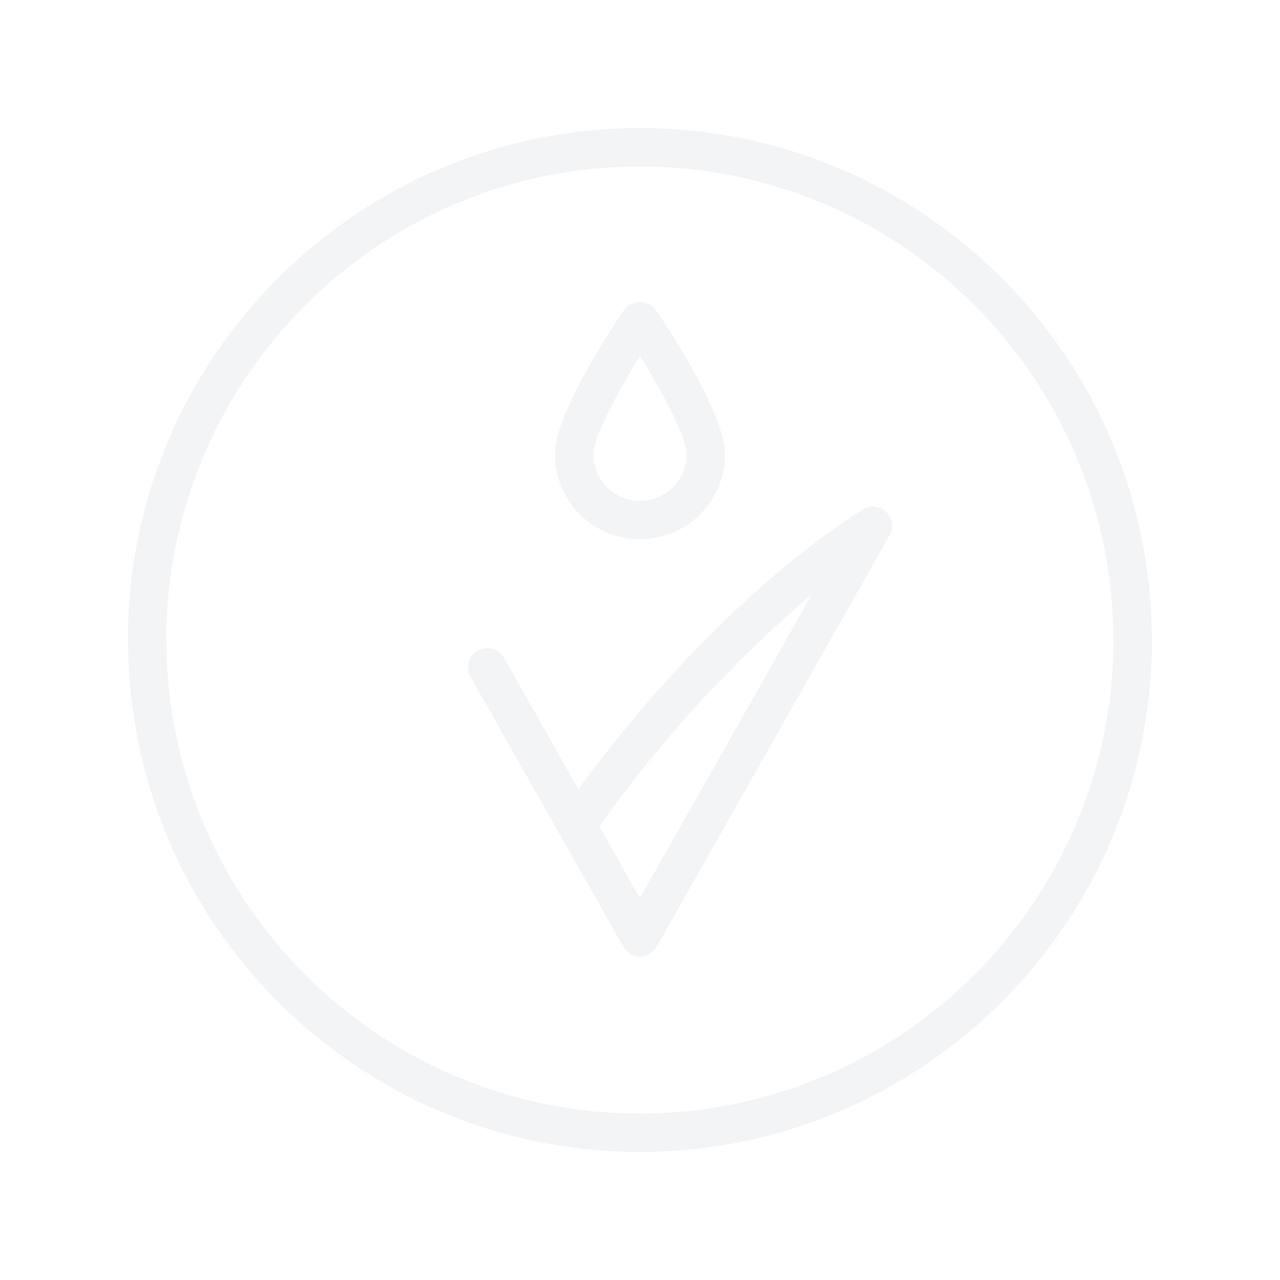 MIZON Enjoy Vital-Up Time Firming Mask 25ml